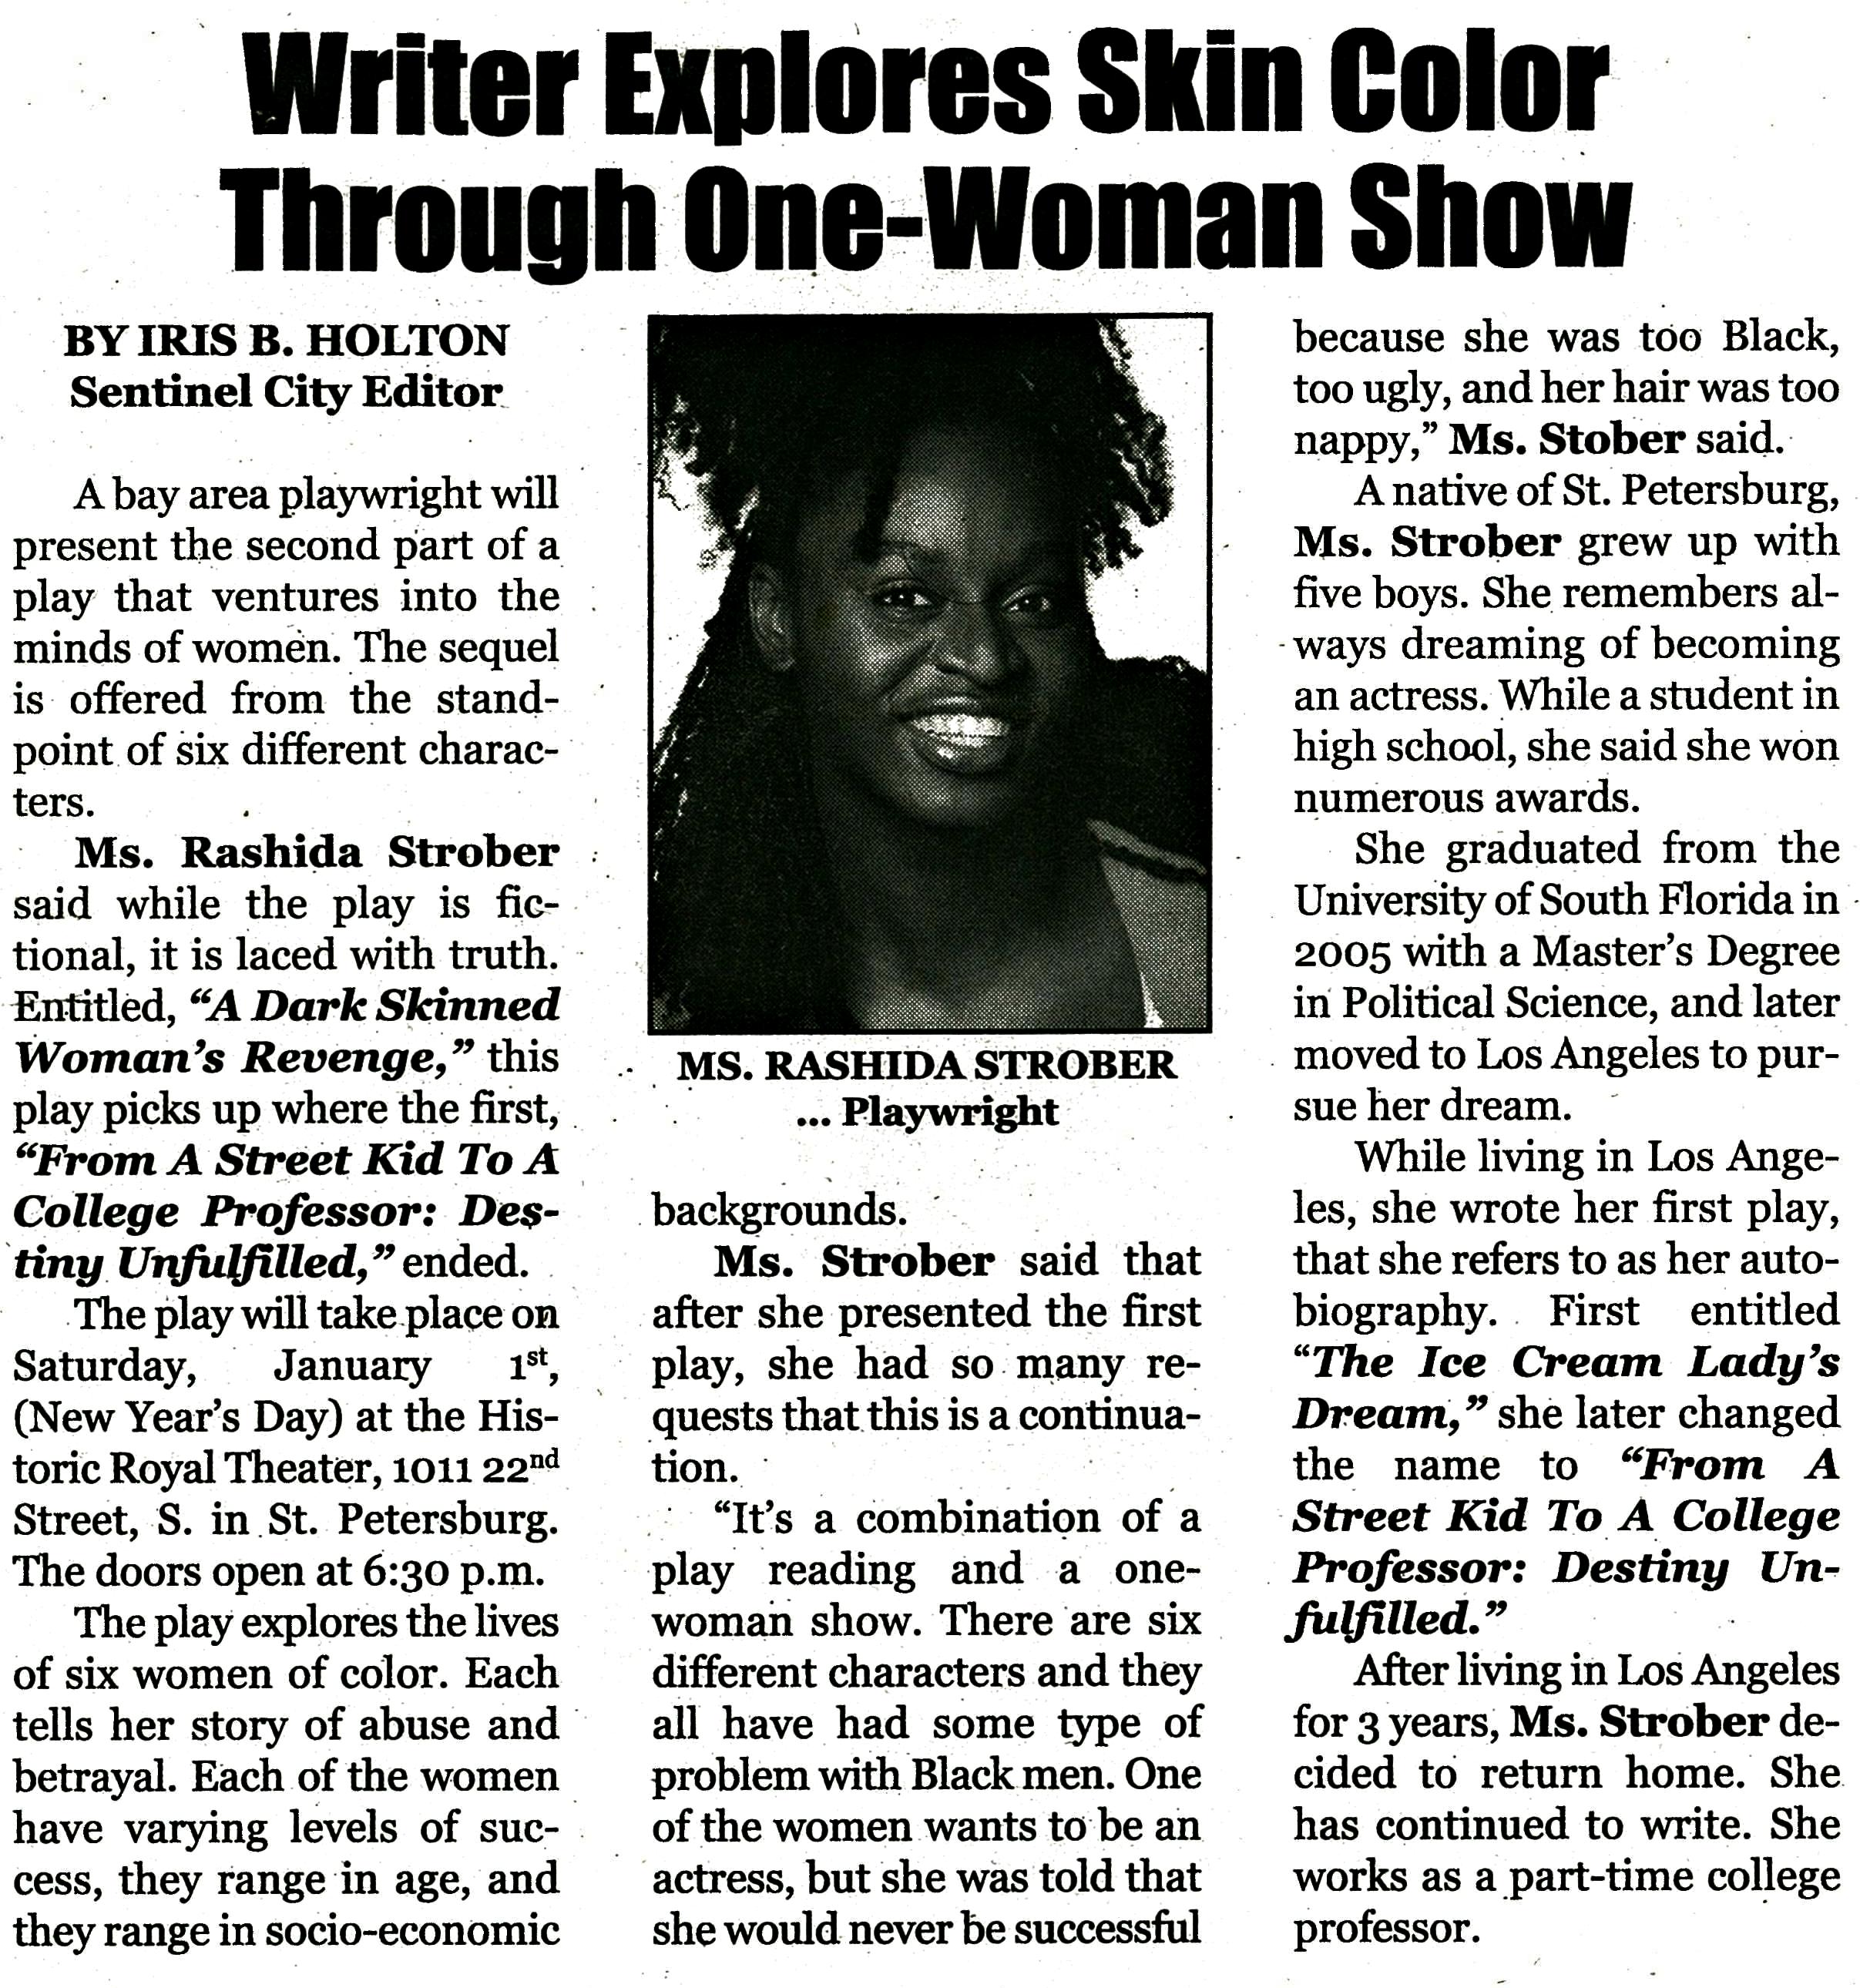 Sentinel City Editor - Iris B Holton